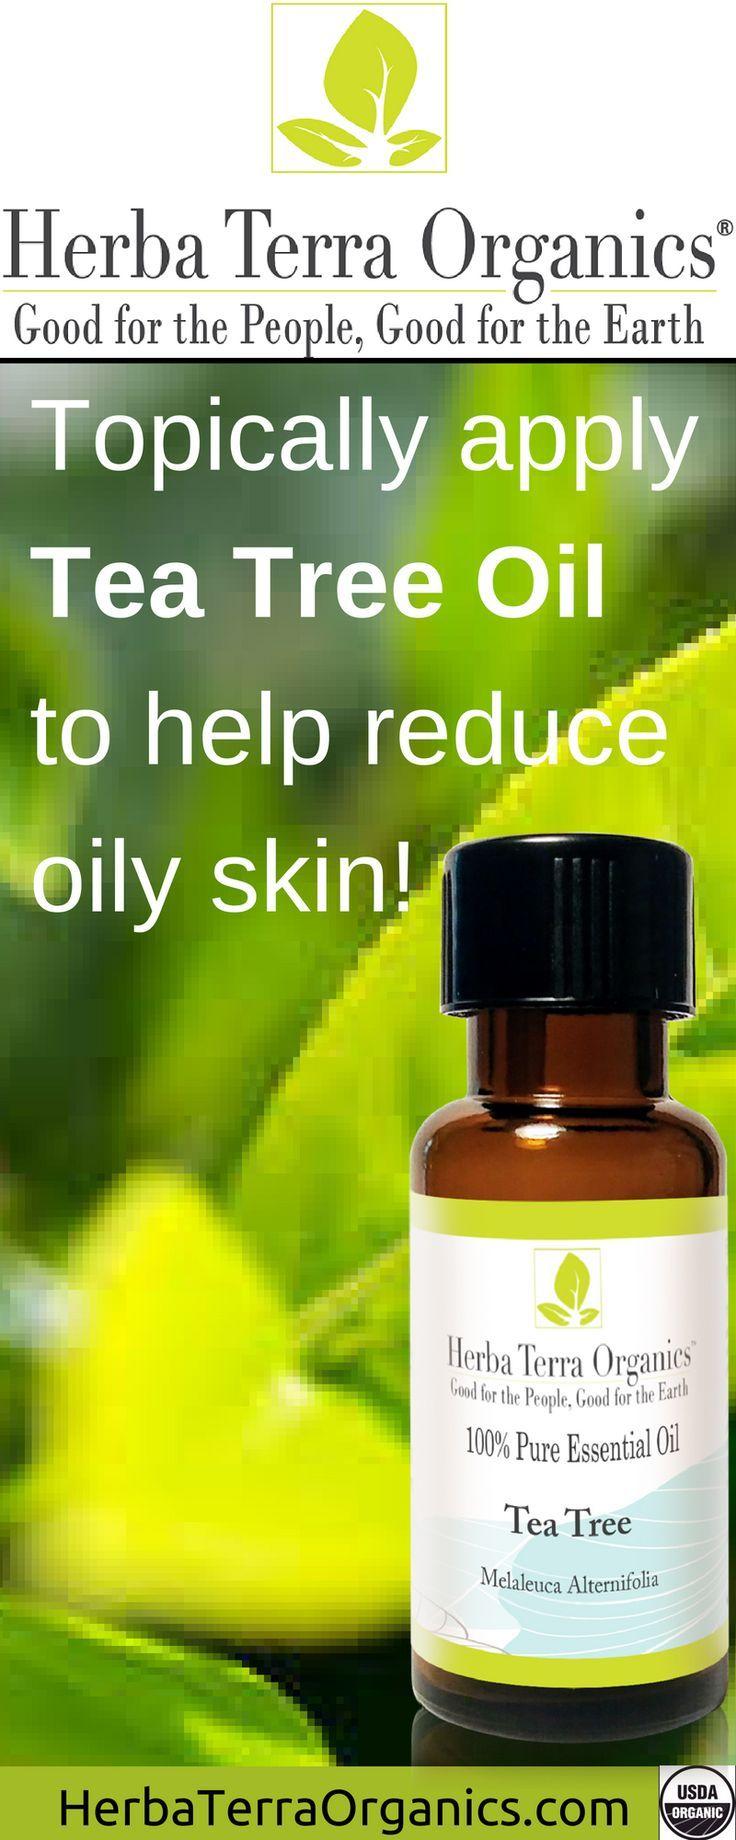 USDA Certified Organic AustralianTea Tree Essential Oil